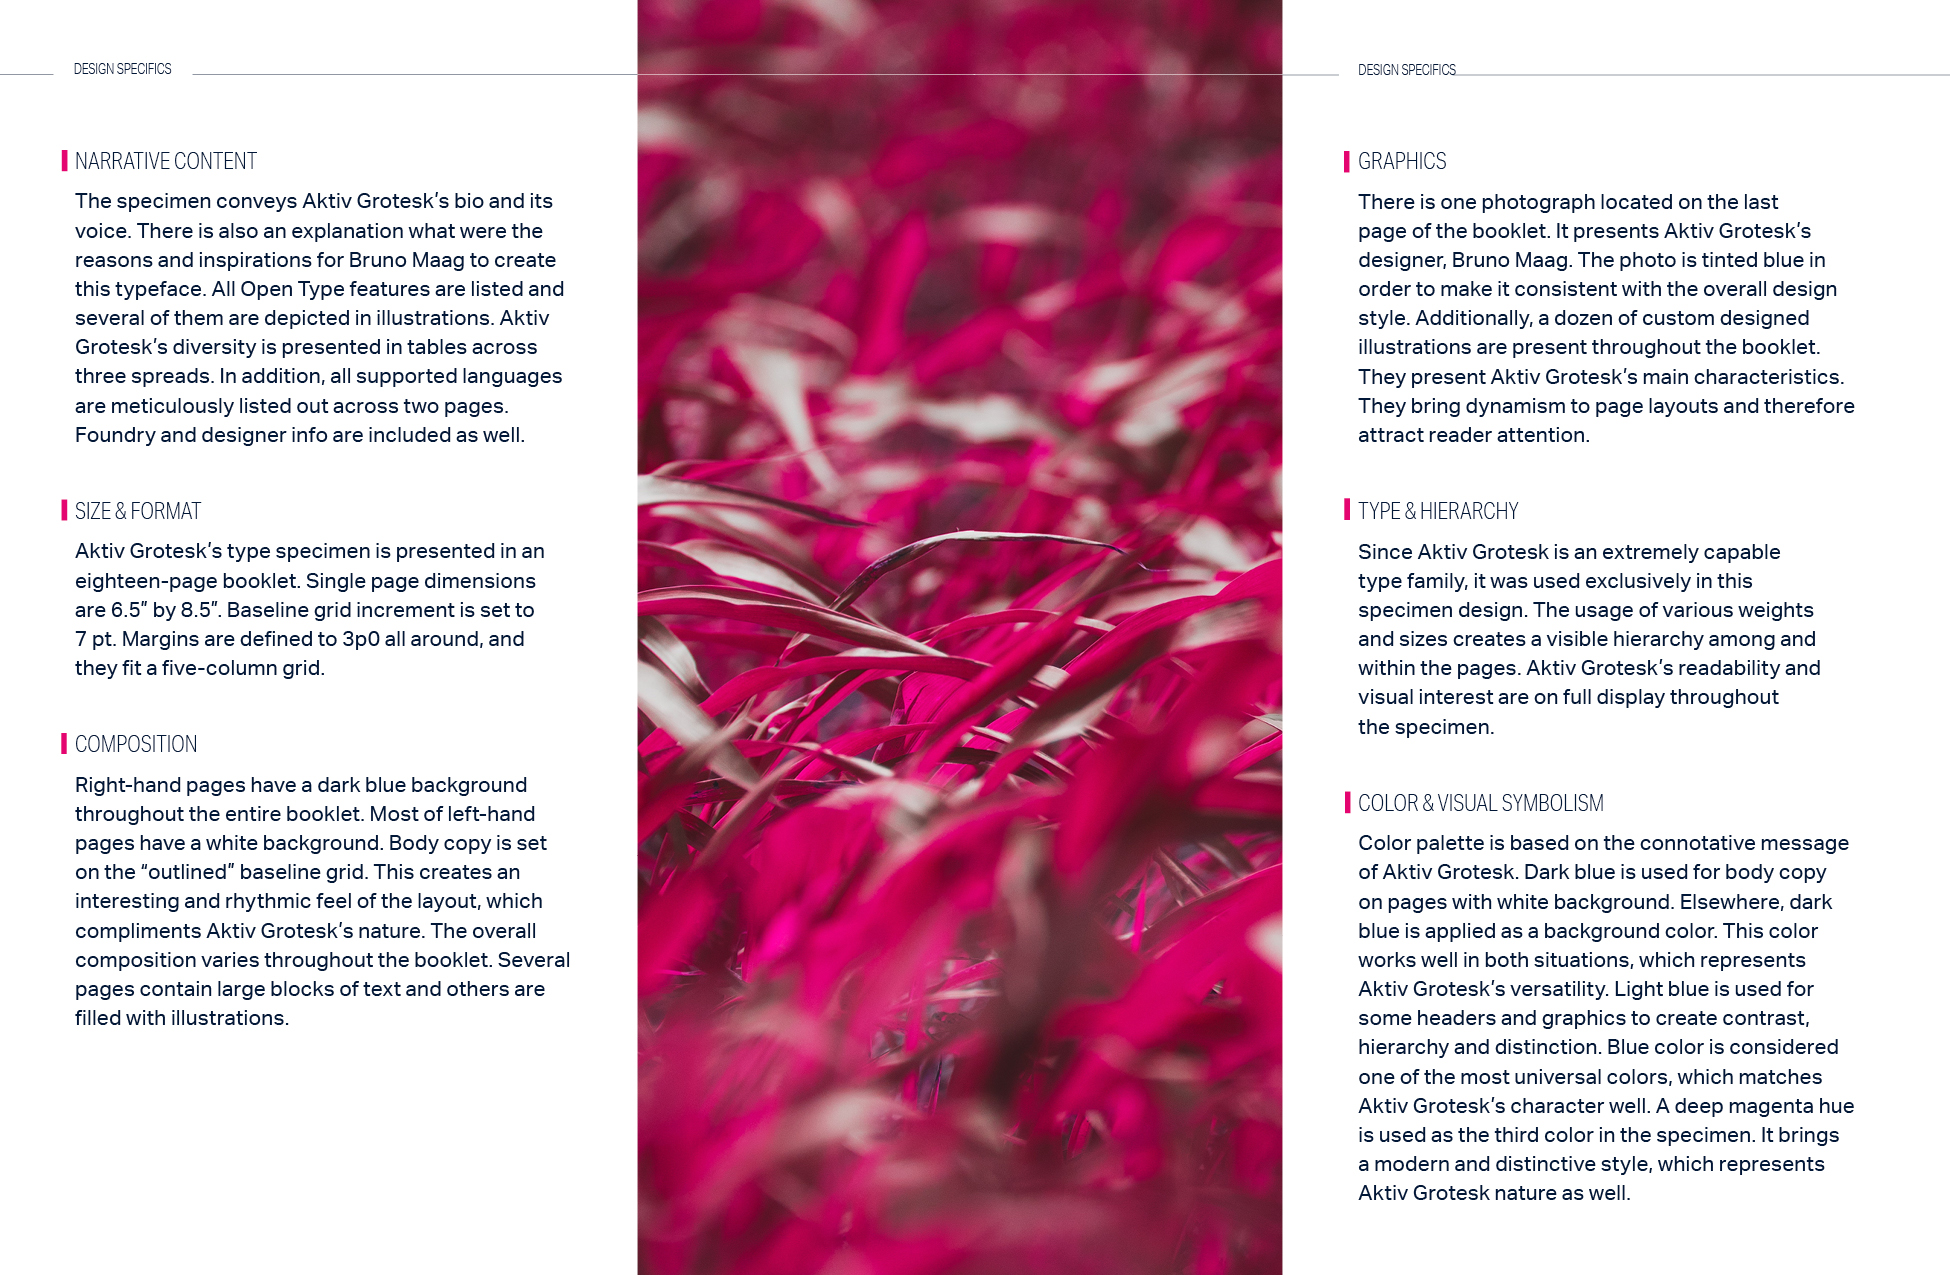 Gajos_design_rationale2.jpg